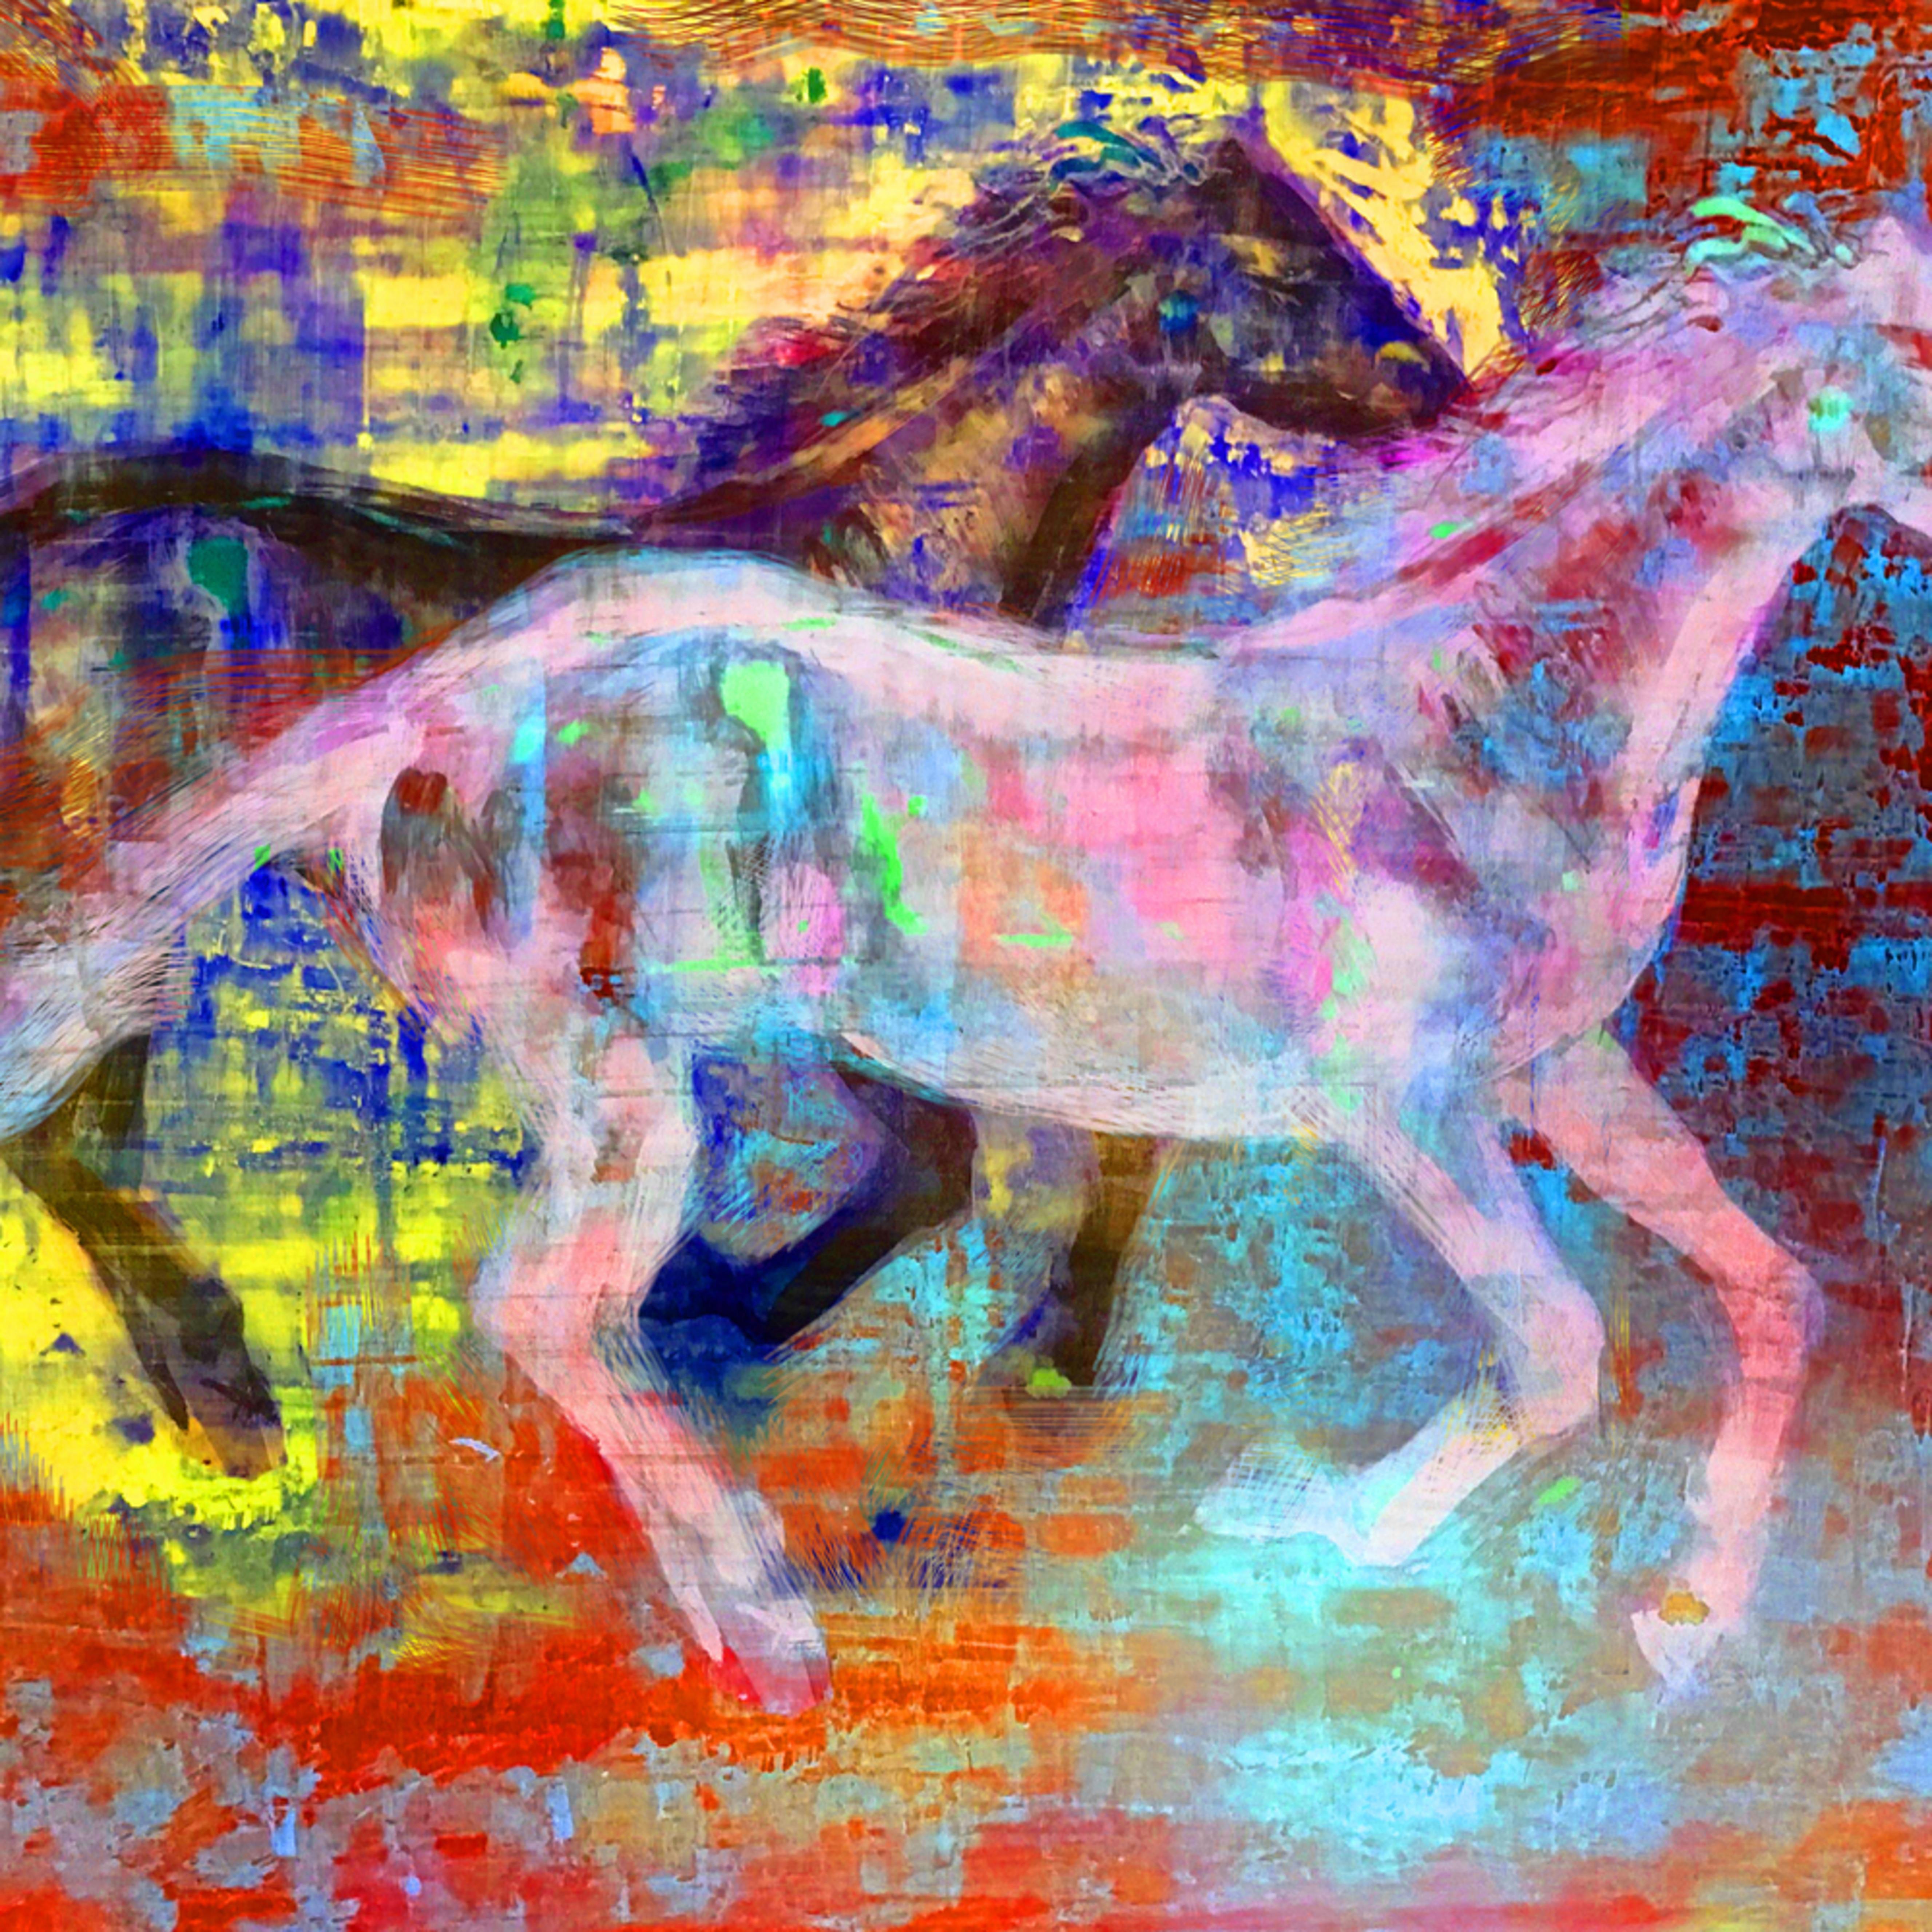 Colorhorse 6b8 5 17 iyupxx